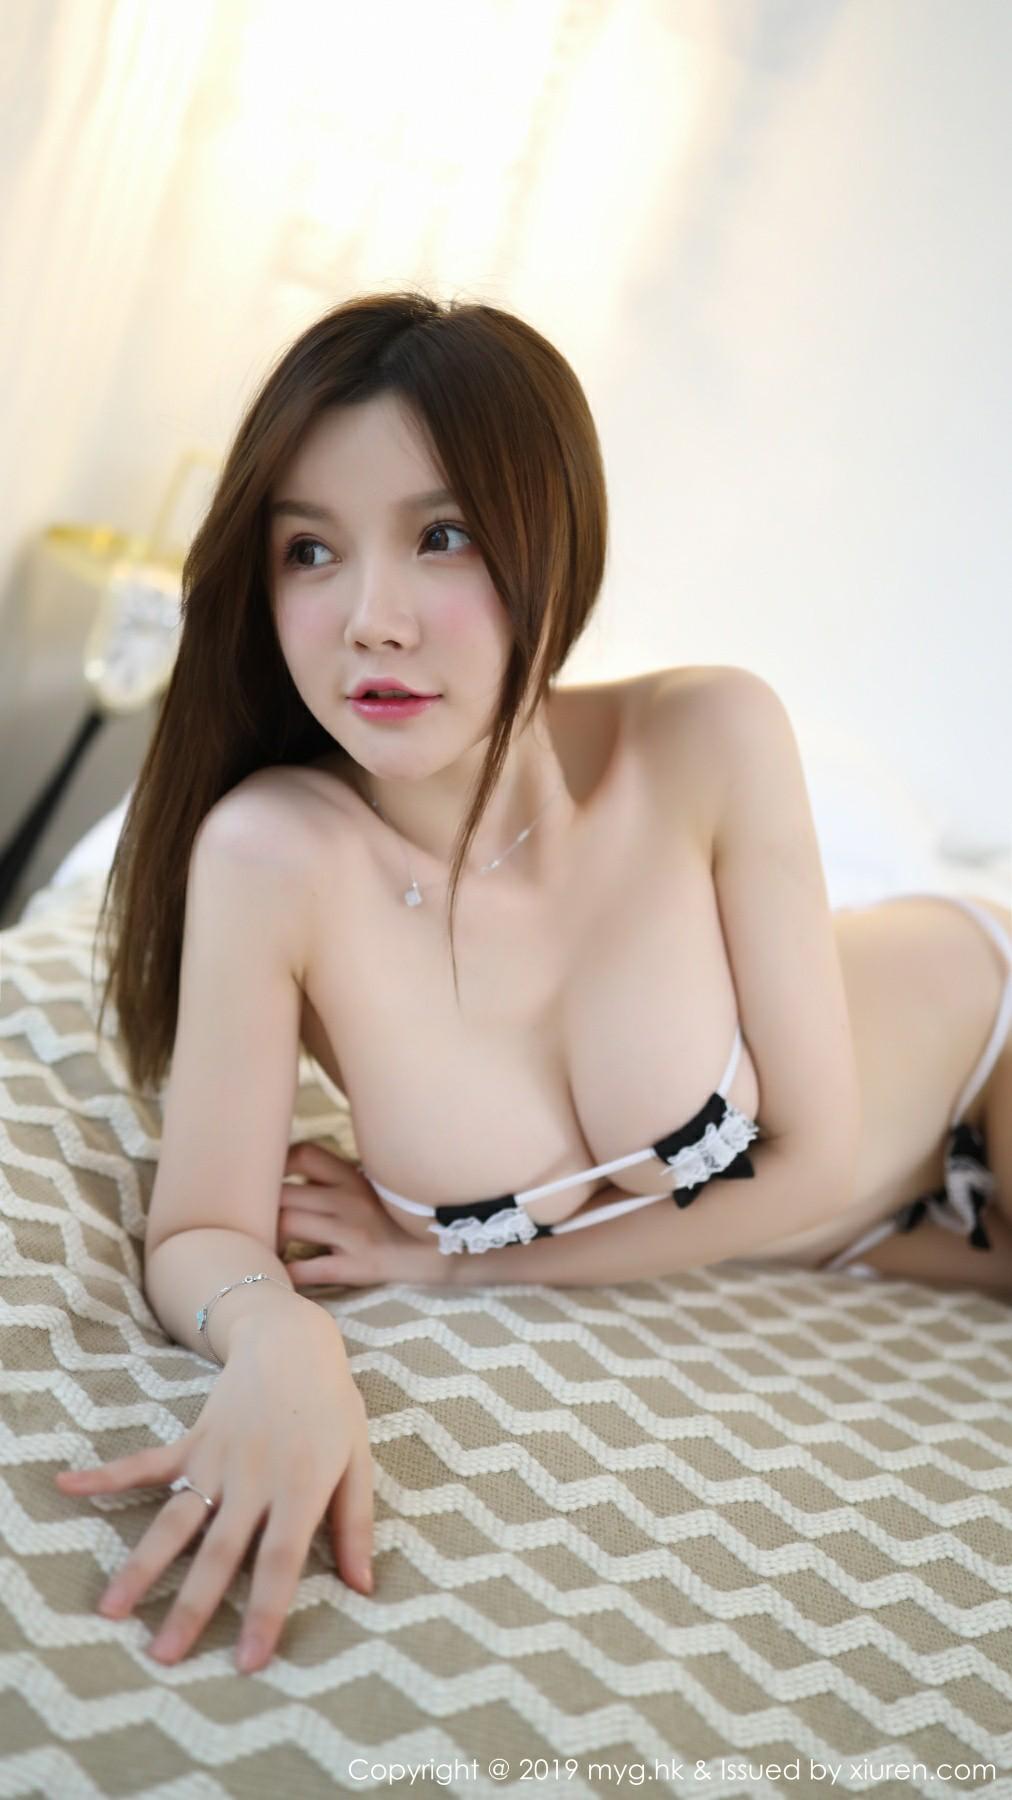 [MyGirl美媛馆]2019.12.17 VOL.414 糯美子Mini[59P] 美媛馆 第4张